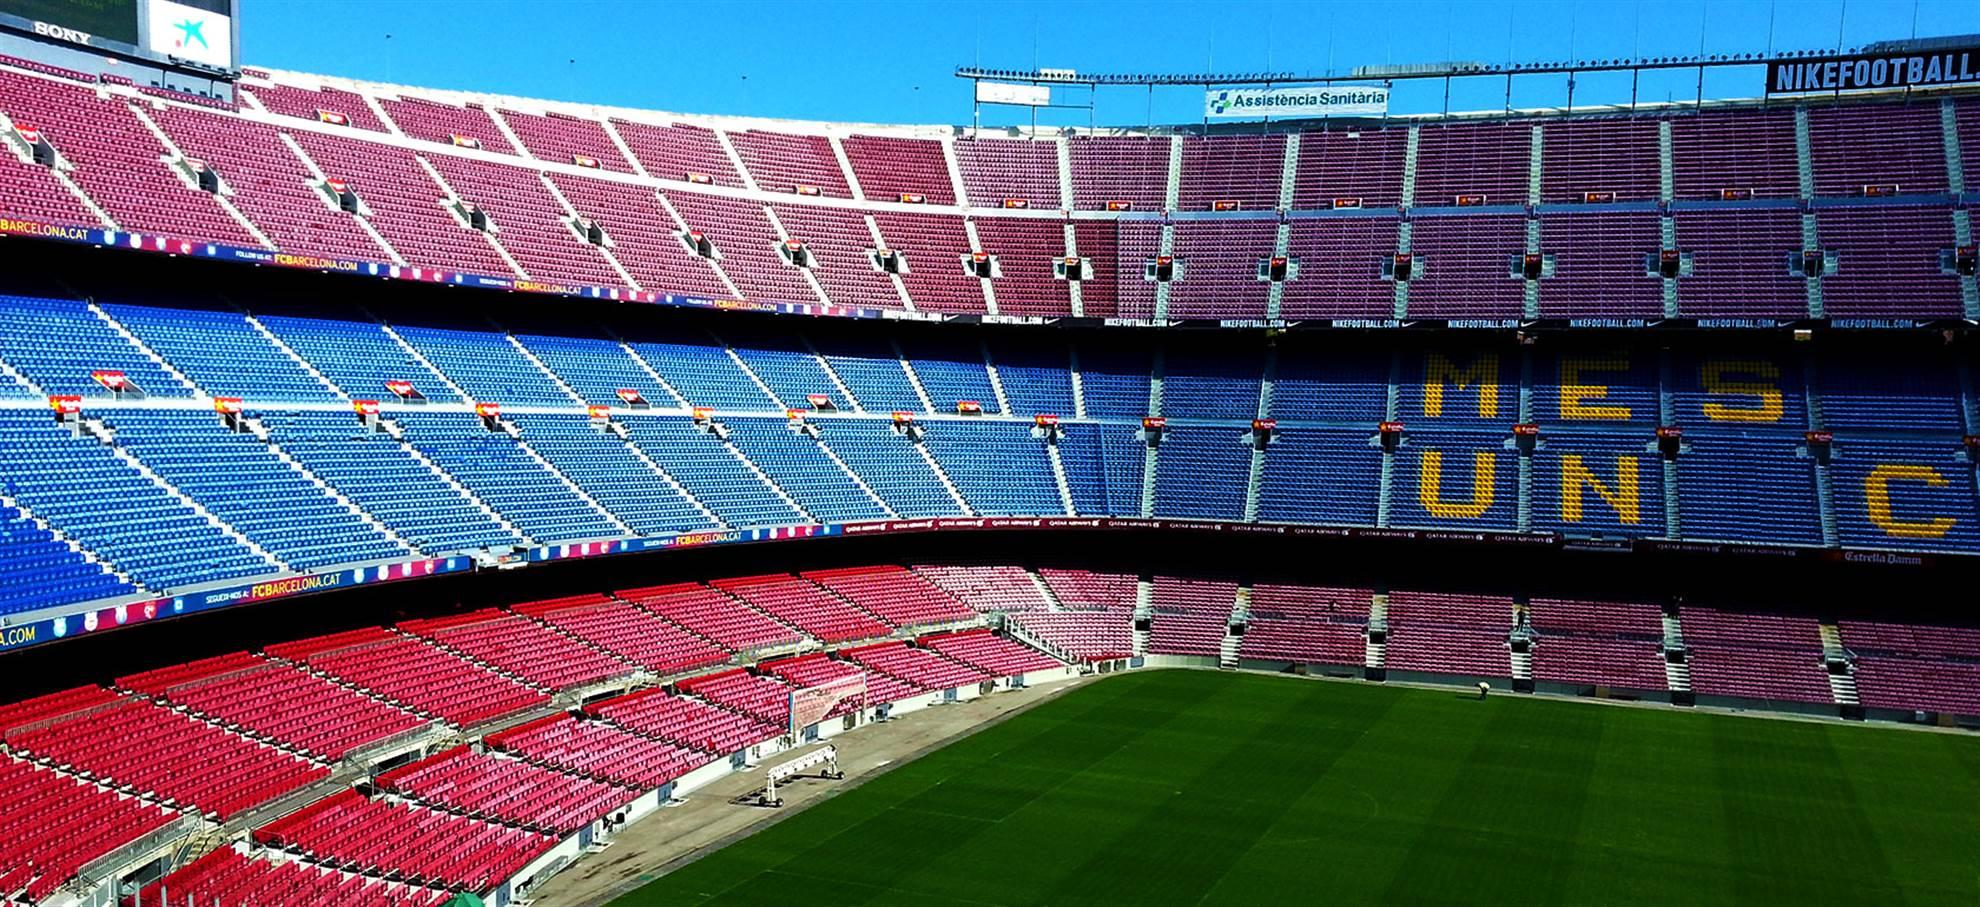 Тур по стадиону ФК Барселона (билет с открытой датой)